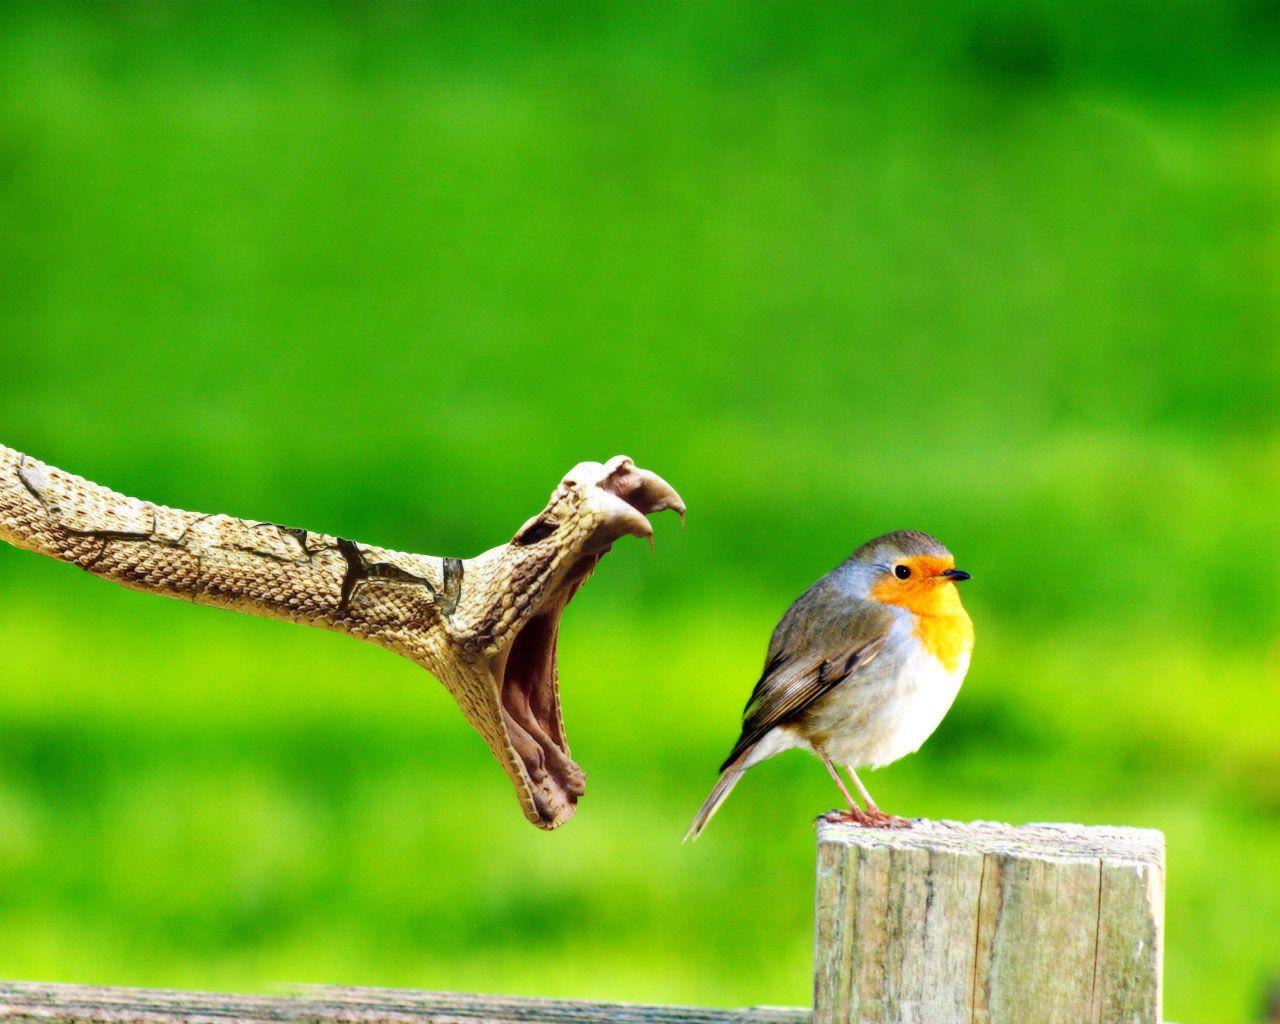 Small Bird In Danger Wallpaper 1280x1024